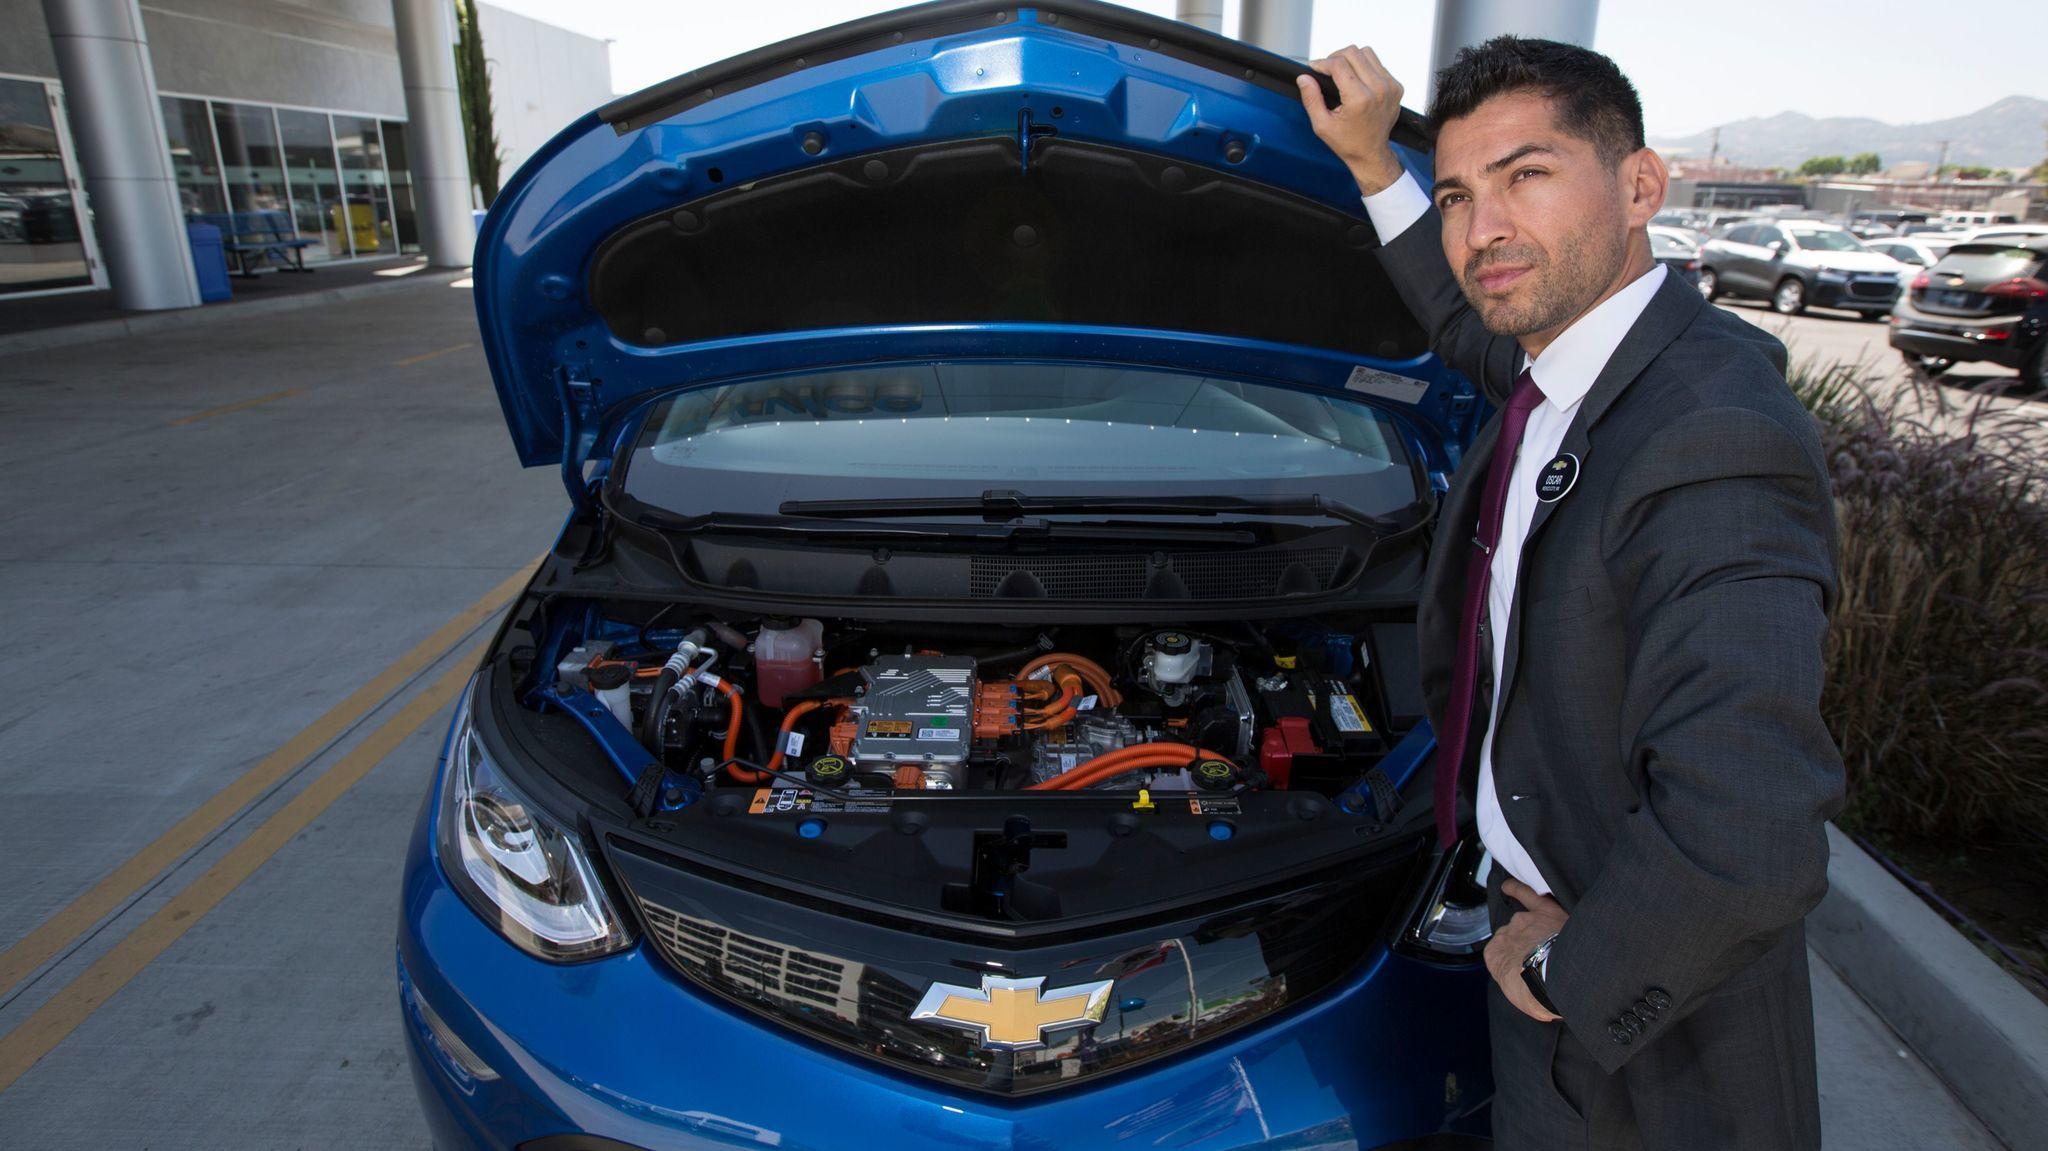 Oscar Gutierrez of Community Chevrolet in Burbank under the hood of a Bolt electric car.